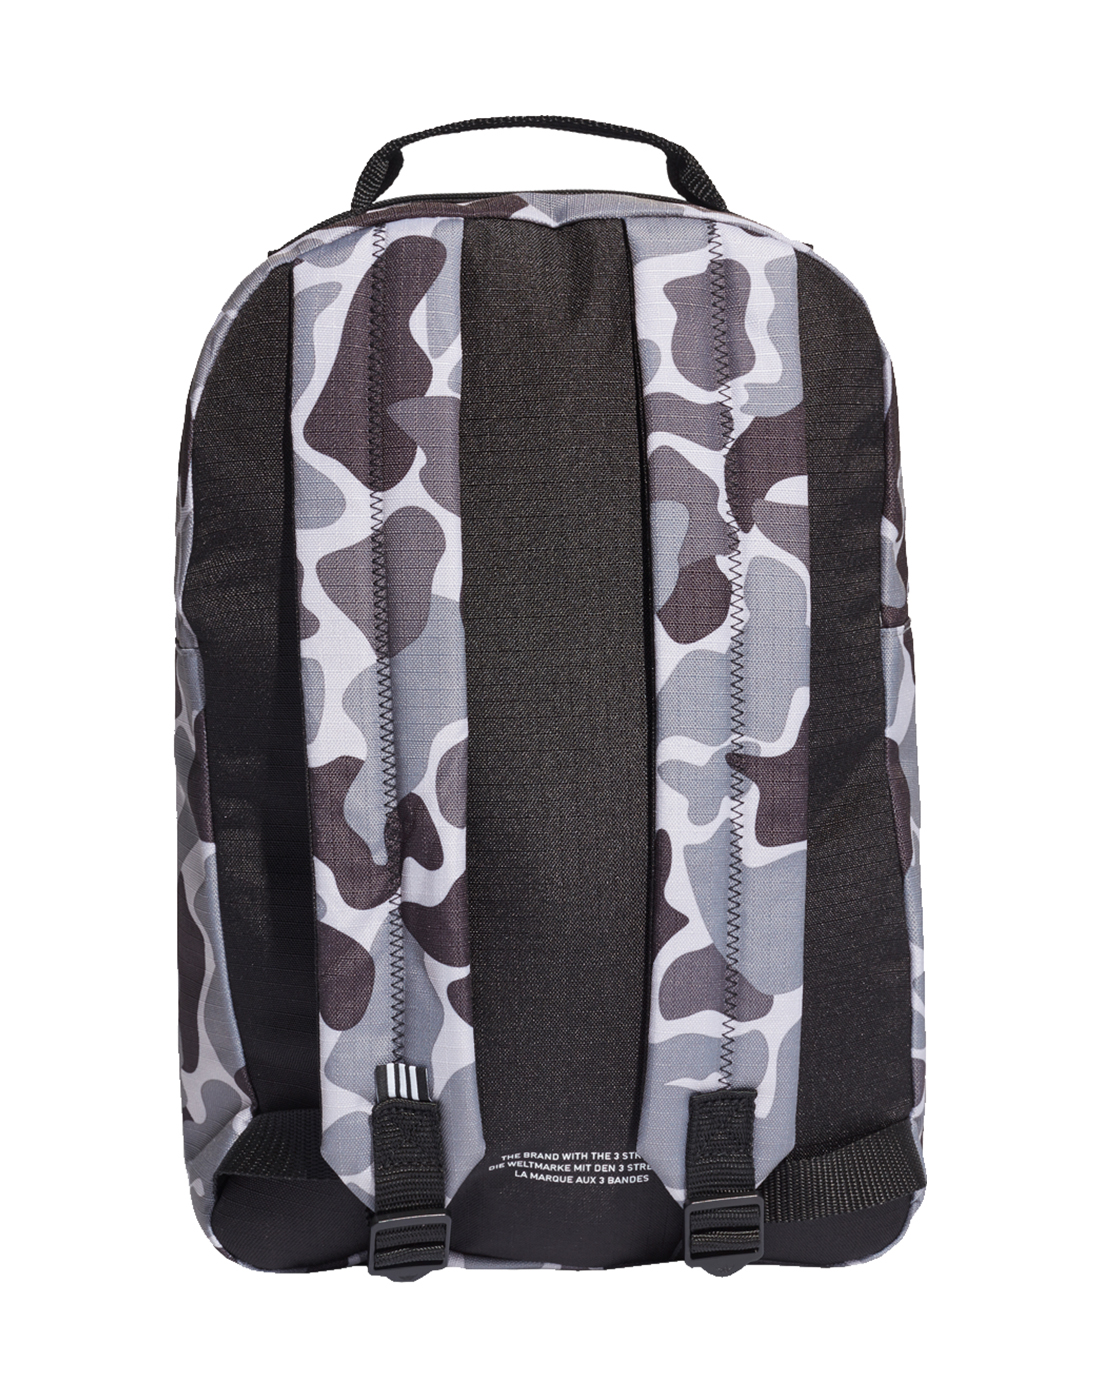 18582f3cc3 adidas Originals. Classic Camo Backpack. Classic Camo Backpack · Classic  Camo Backpack